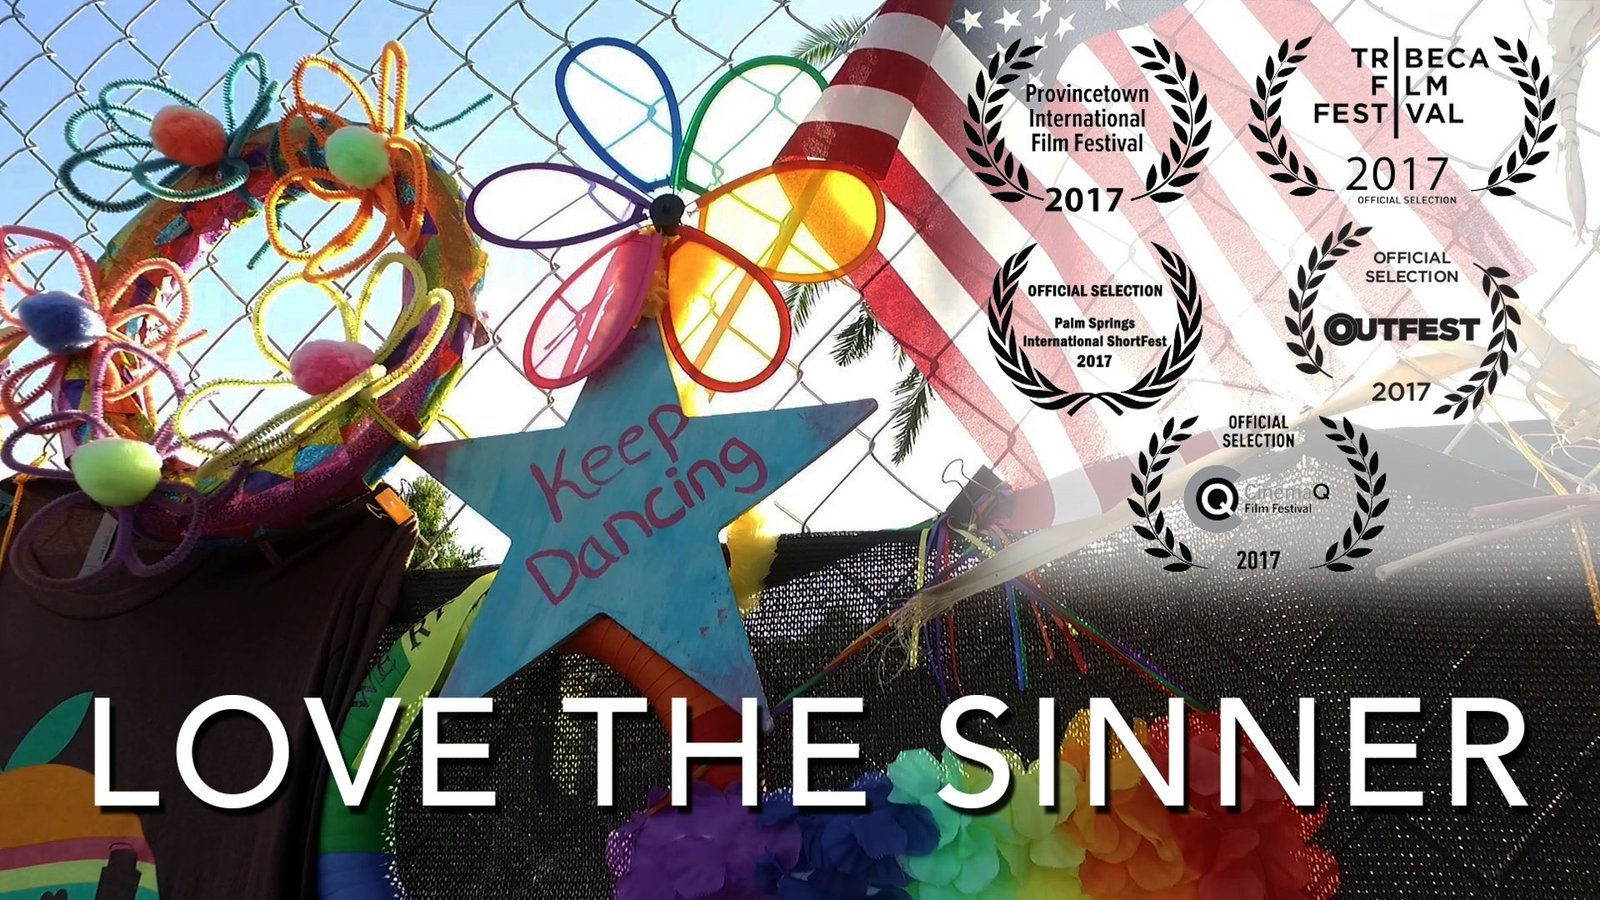 Love The Sinner - A Dialogue Between a Queer Filmmaker and Evangelical Christians